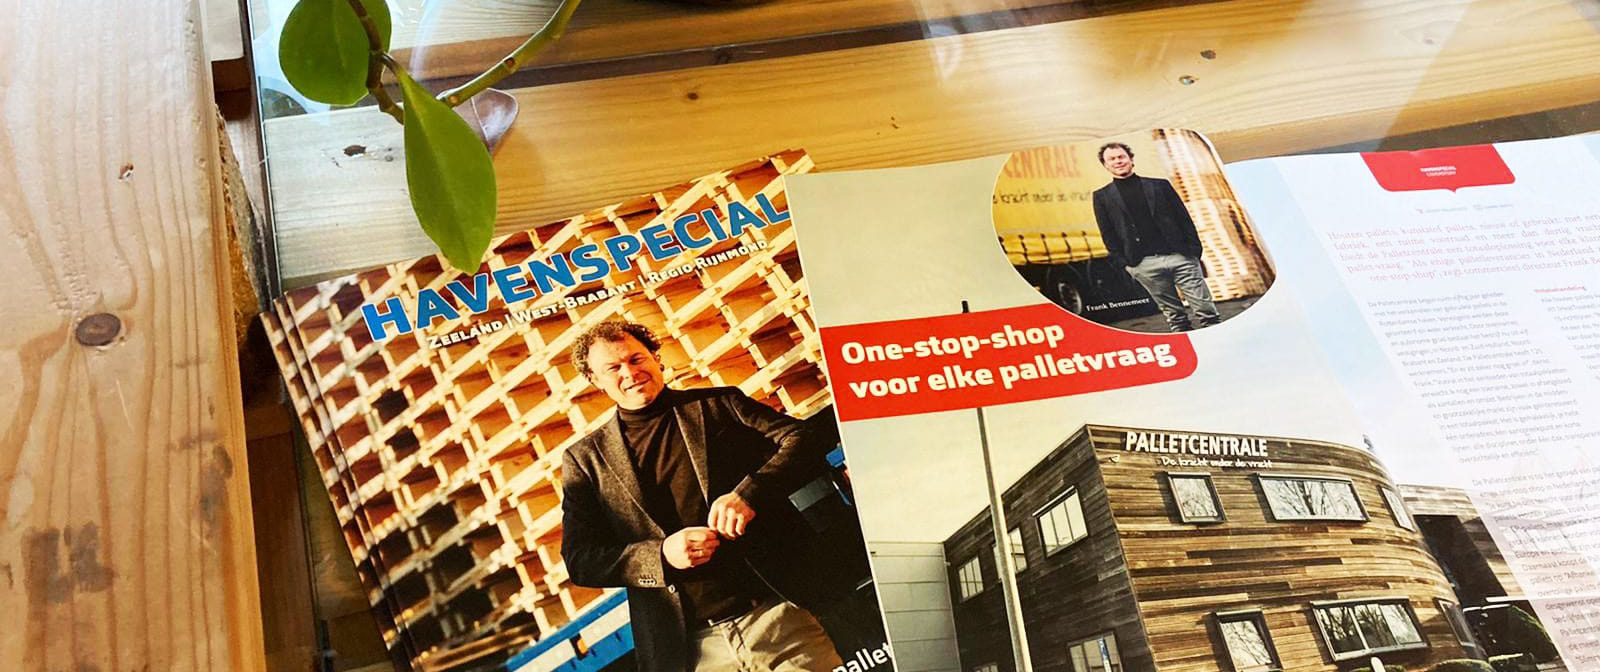 magazine One stop shop pallets